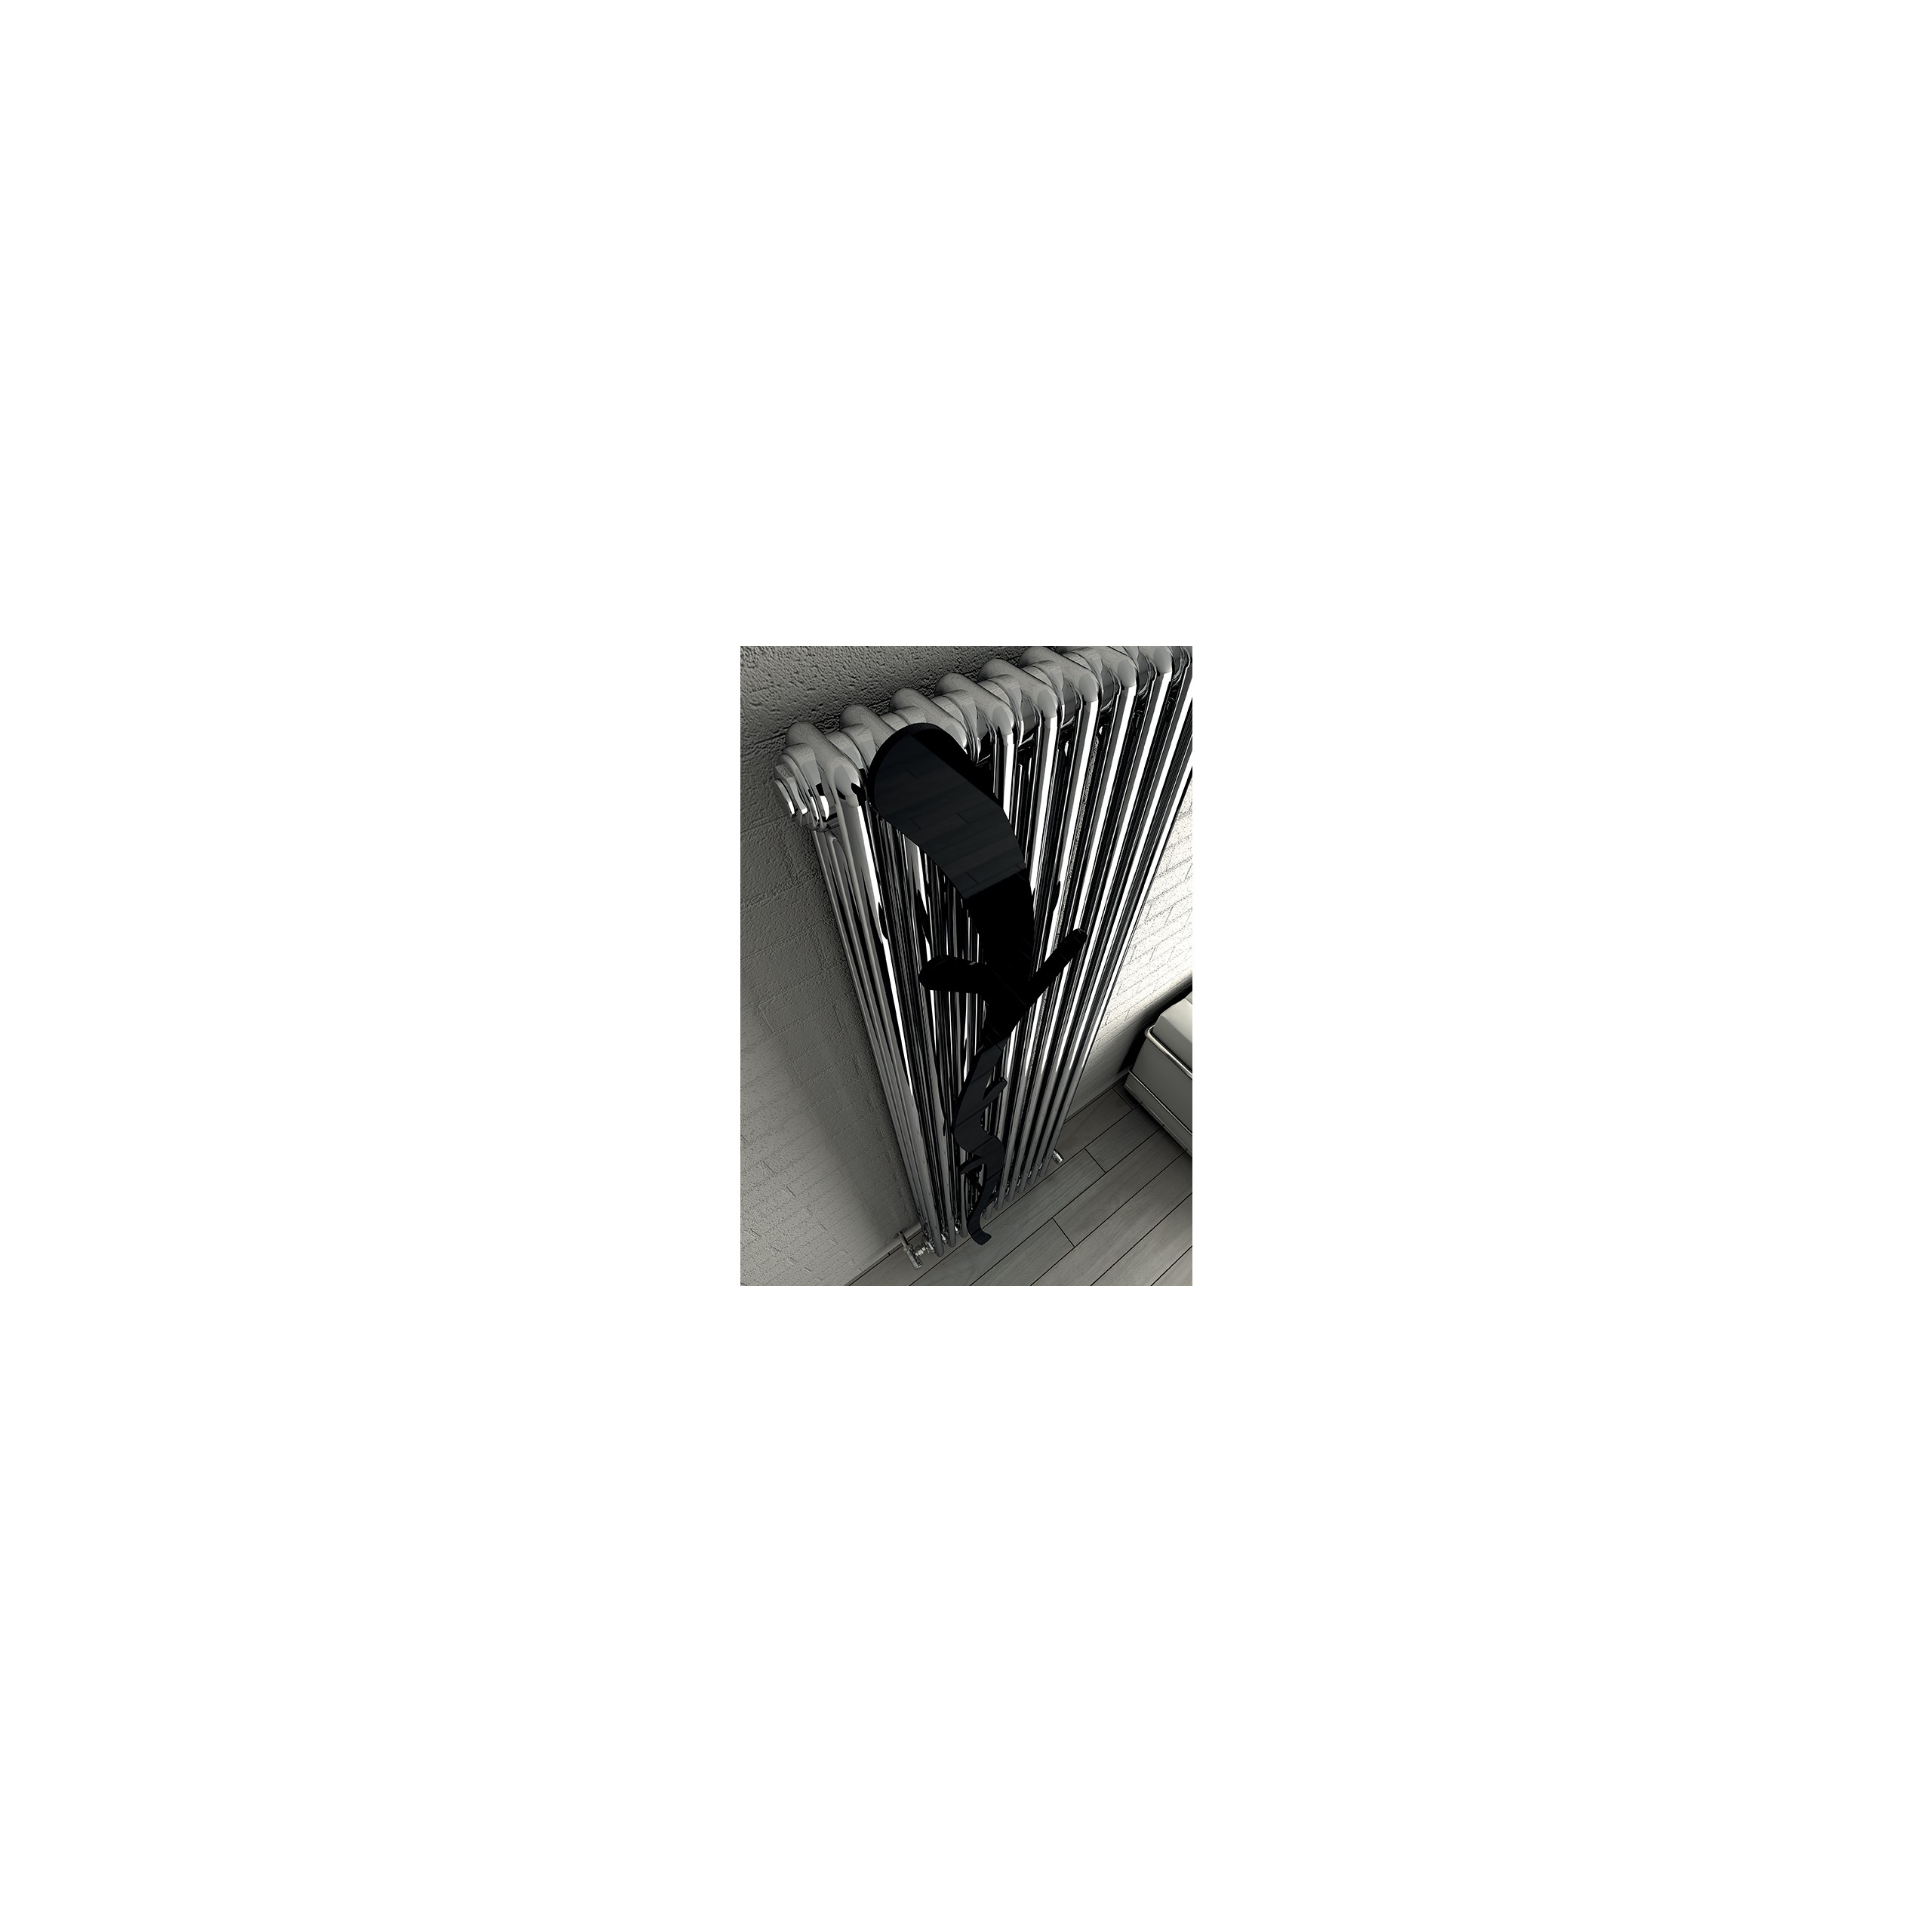 https://edezeen.com/media/catalog/product/cache/2/image/2560x/602f0fa2c1f0d1ba5e241f914e856ff9/e/d/edezeen-irsap-tesi-chrome-plated-best-price-2.jpg